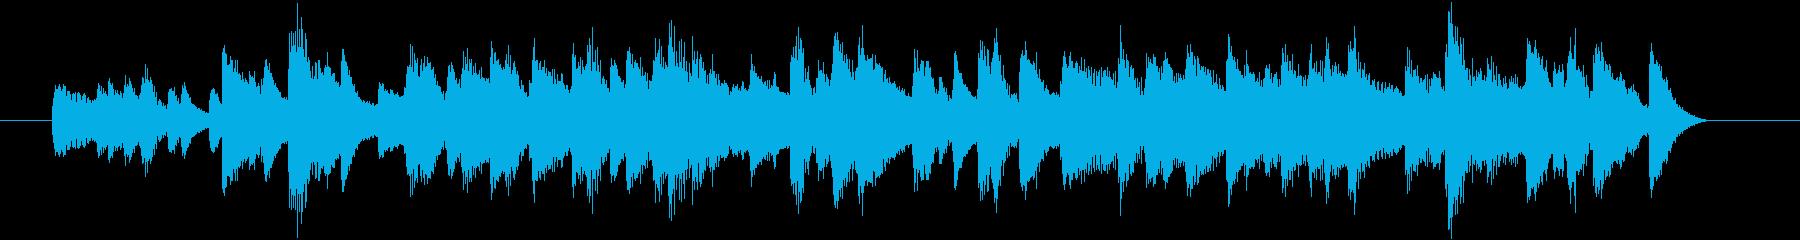 JAZZYで心弾むお洒落なピアノジングルの再生済みの波形